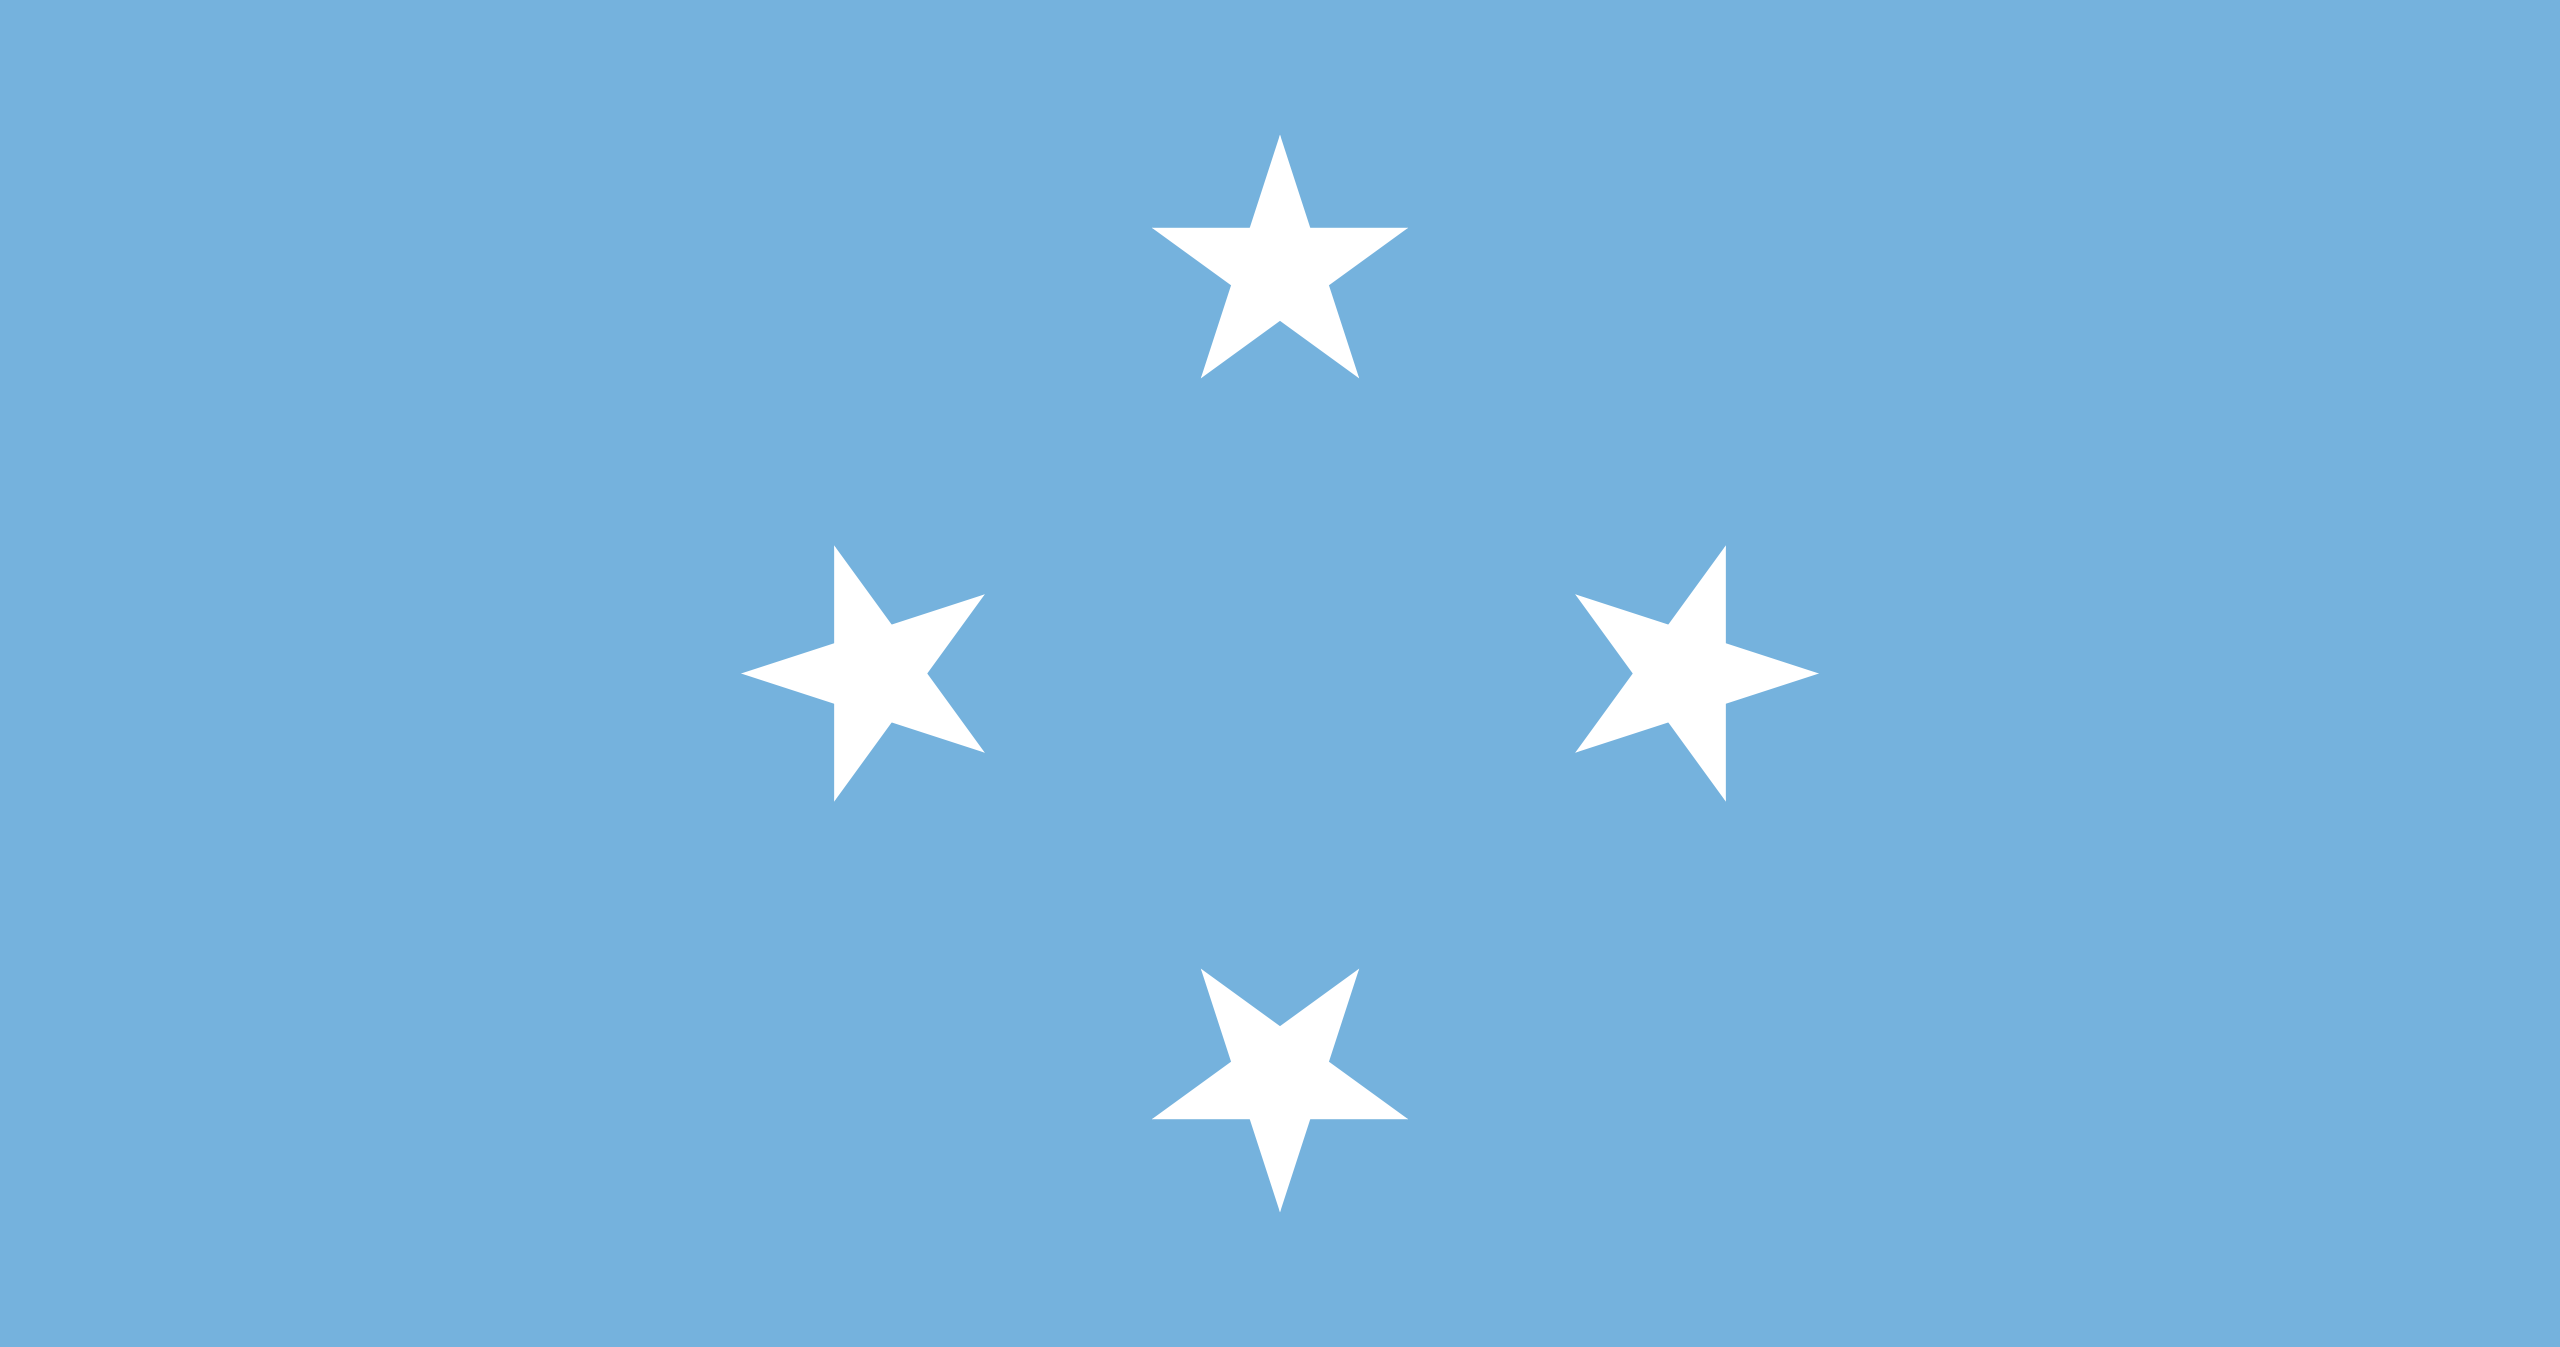 micronesia, страна, Эмблема, логотип, символ - Обои HD - Профессор falken.com